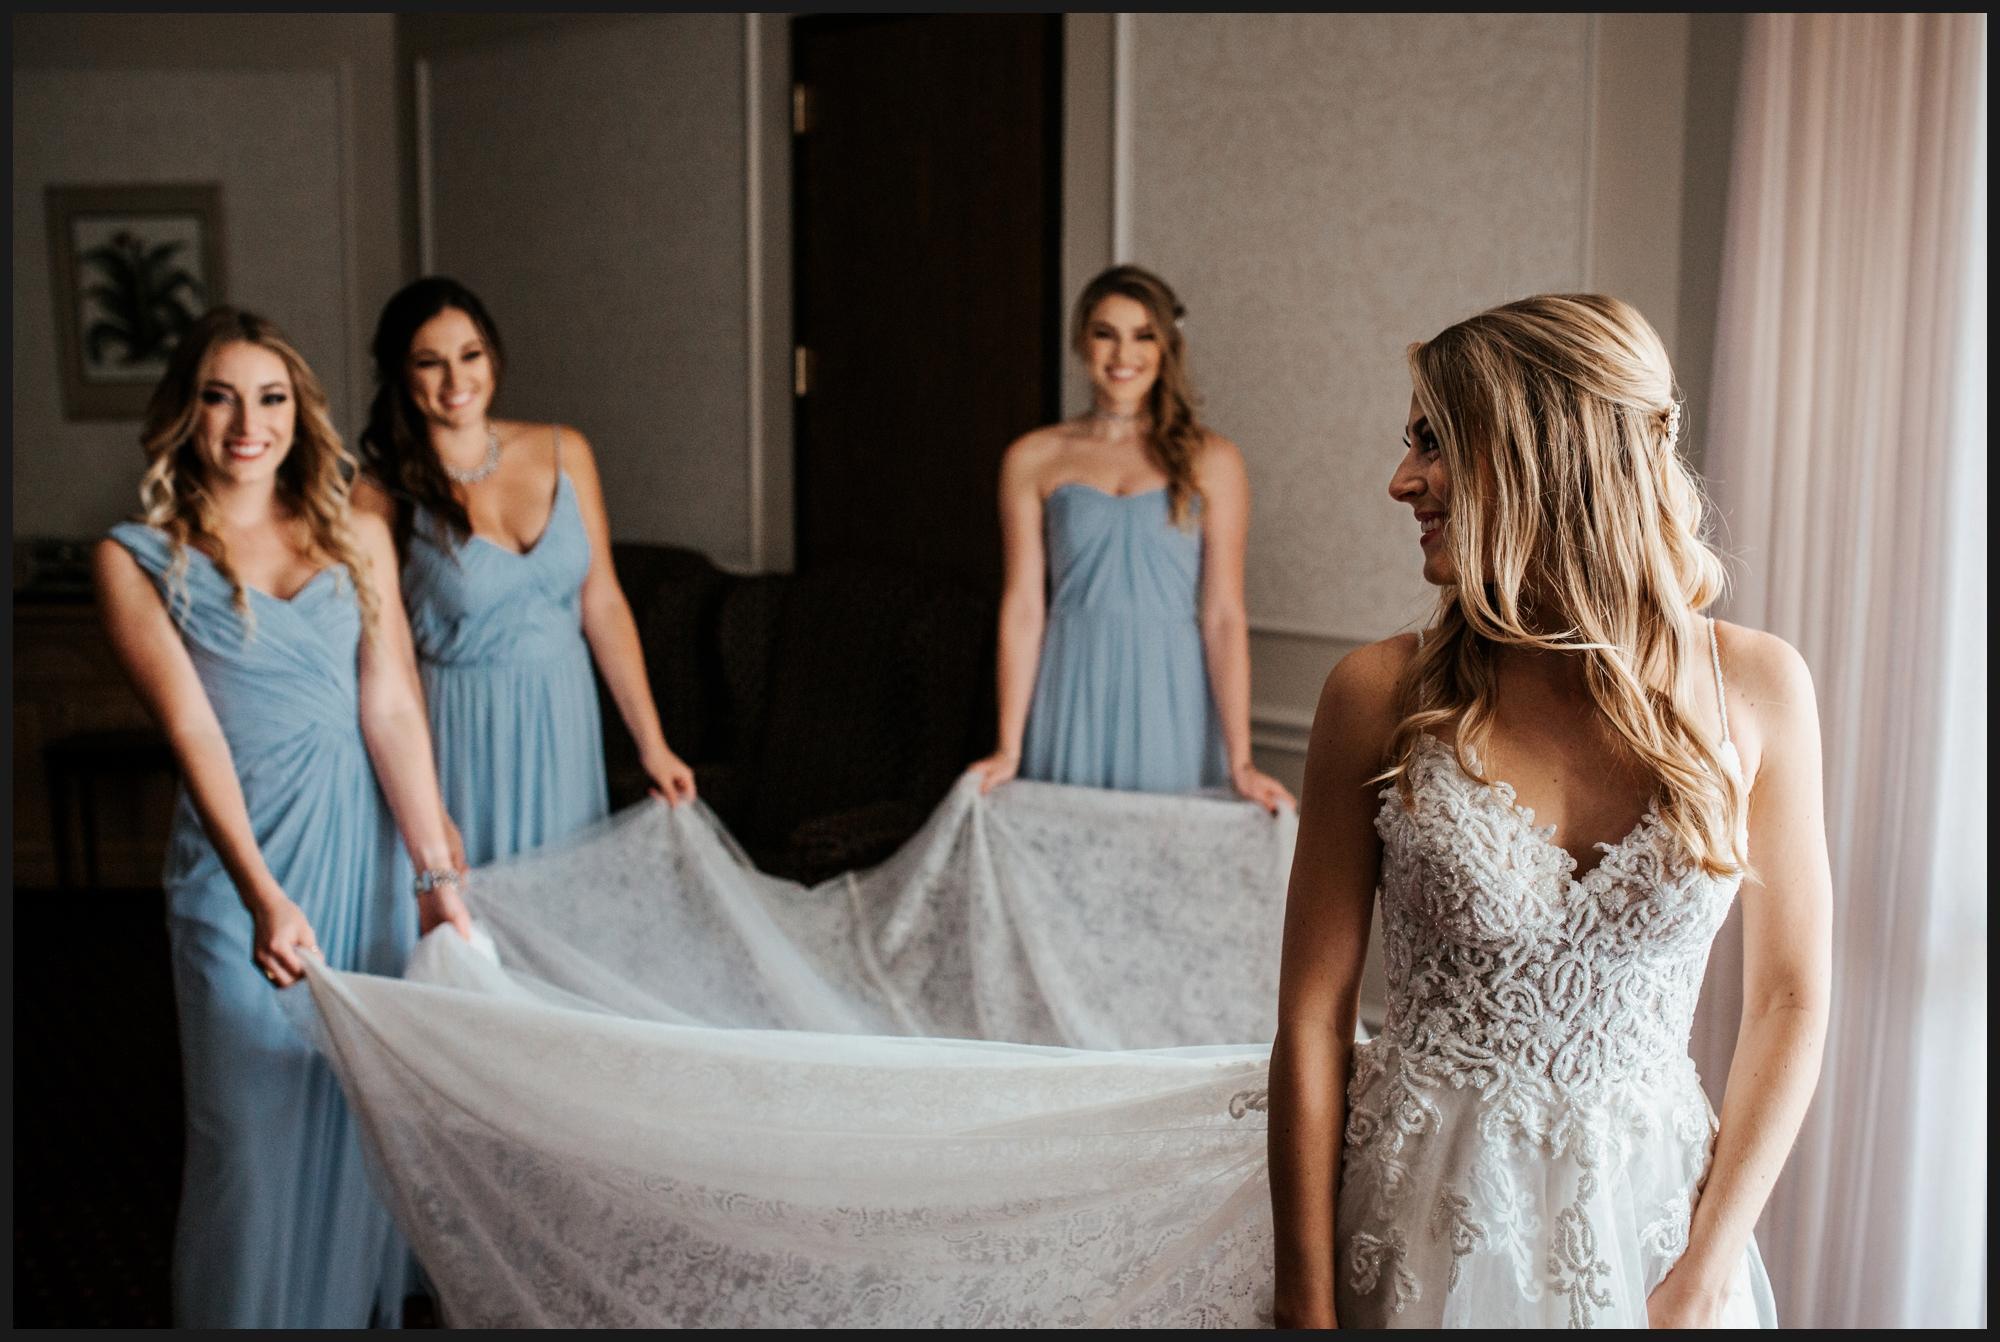 Orlando-Wedding-Photographer-destination-wedding-photographer-florida-wedding-photographer-bohemian-wedding-photographer_0053.jpg